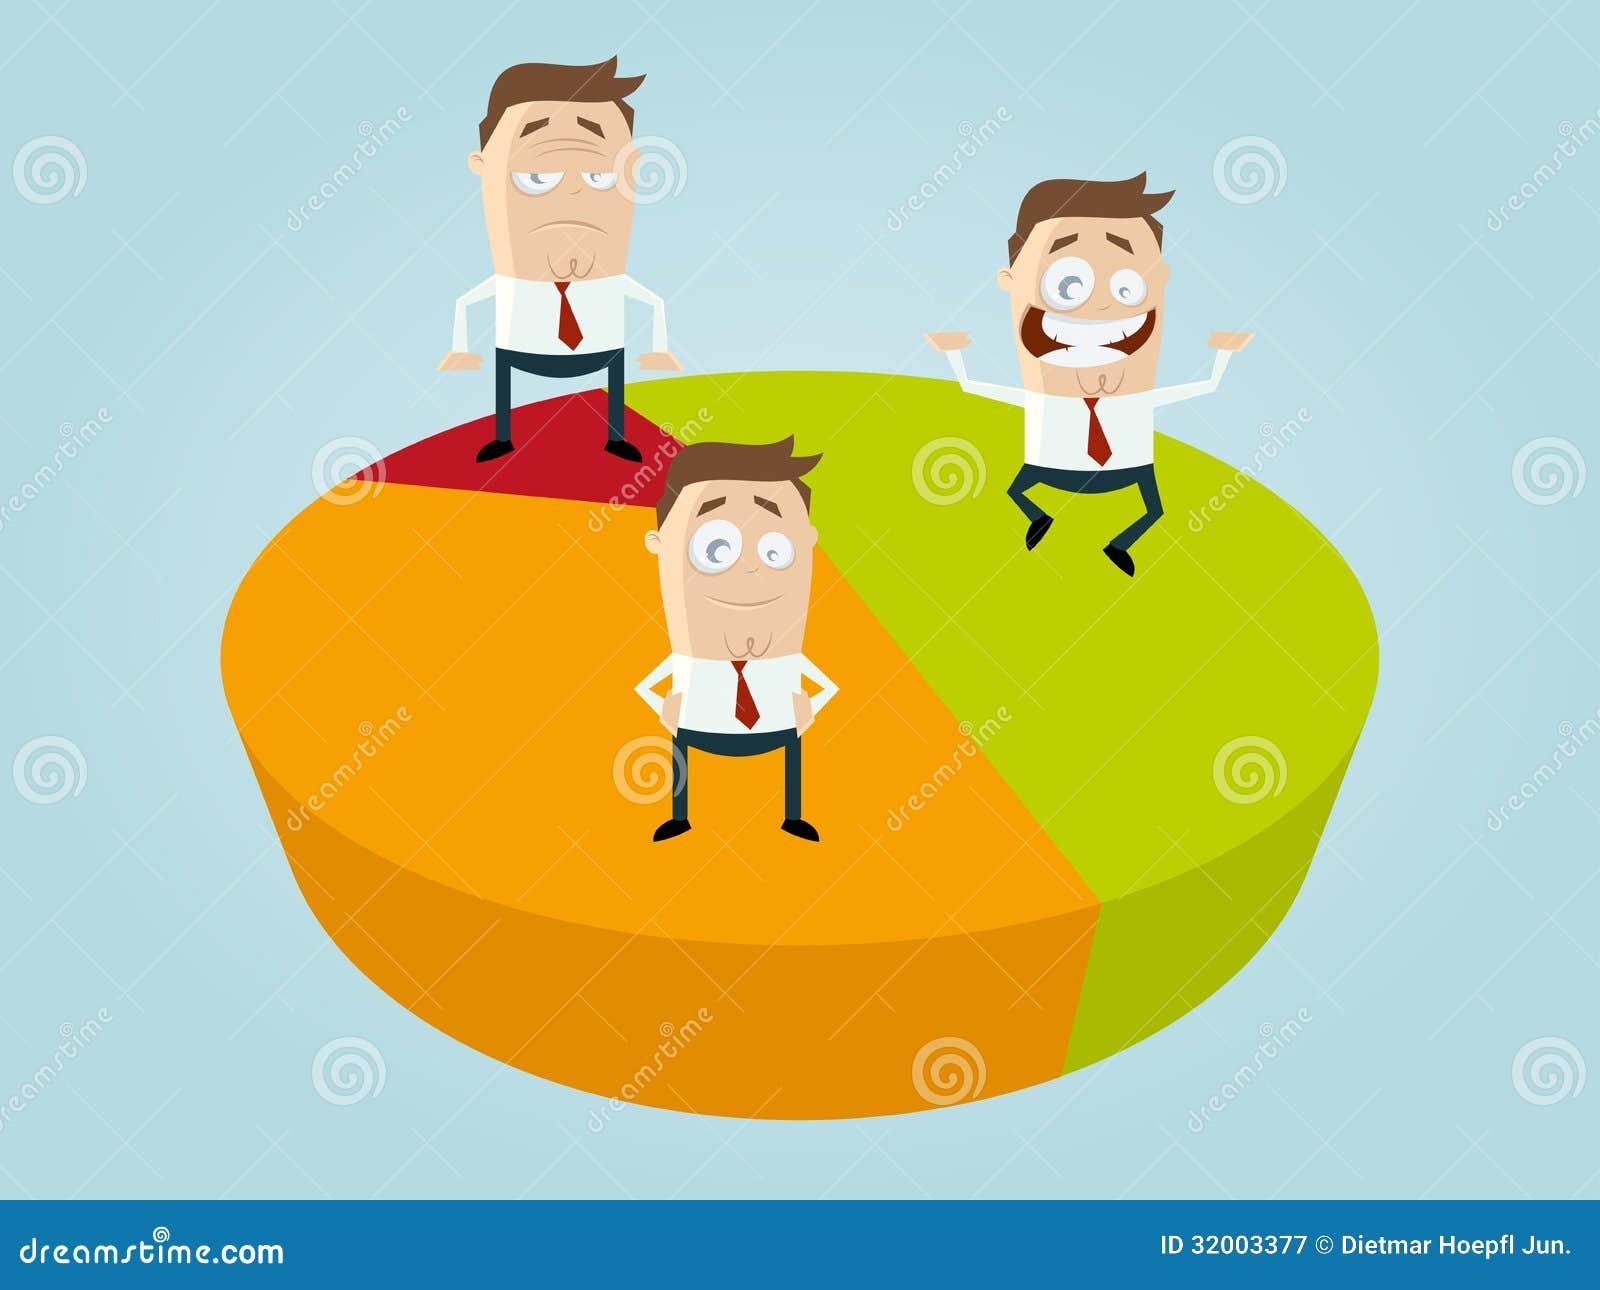 business cartoon men on diagram stock vector image 32003377. Black Bedroom Furniture Sets. Home Design Ideas